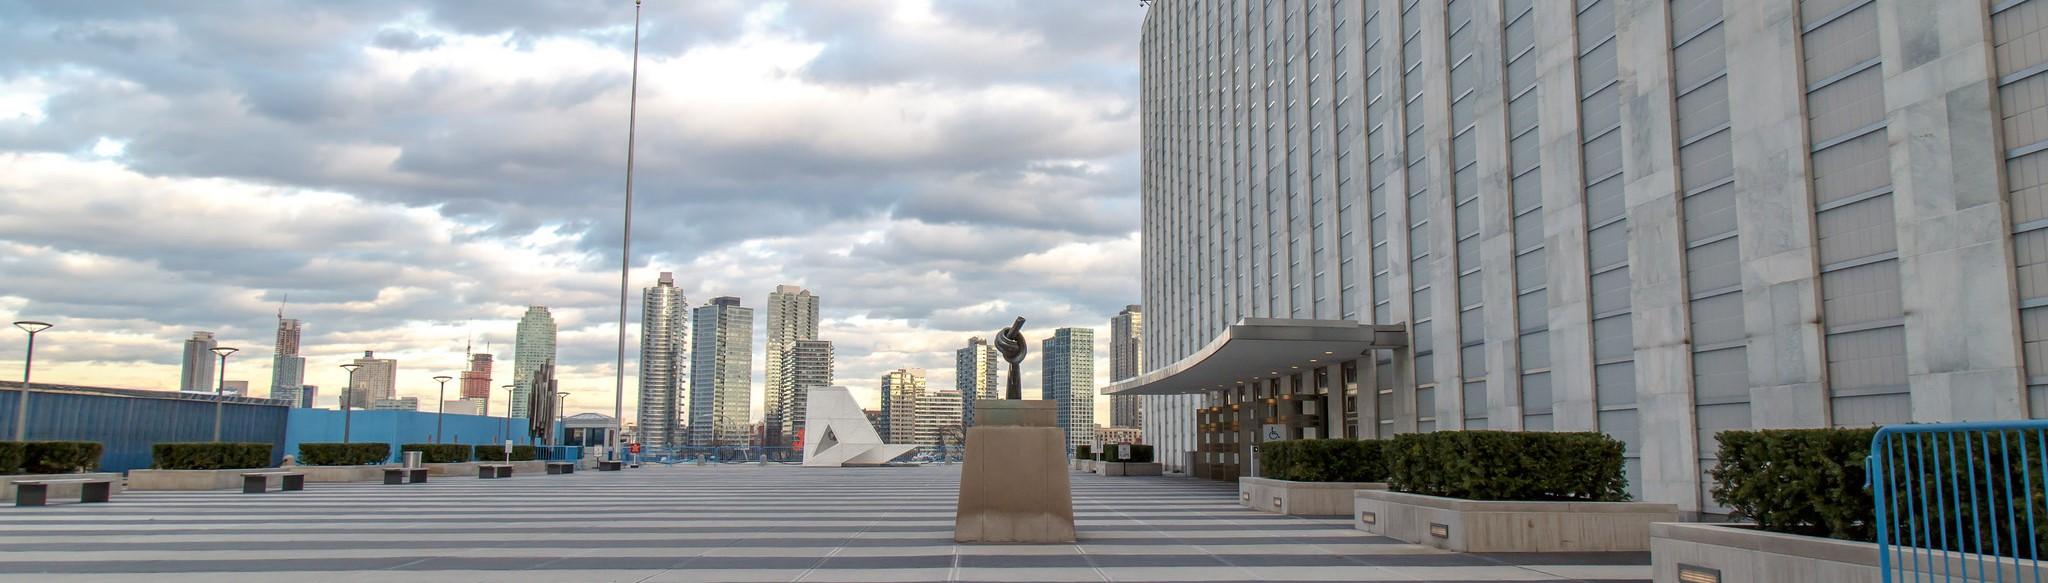 United Nations entrance, New York (Photo: Flickr/John Gillespie)